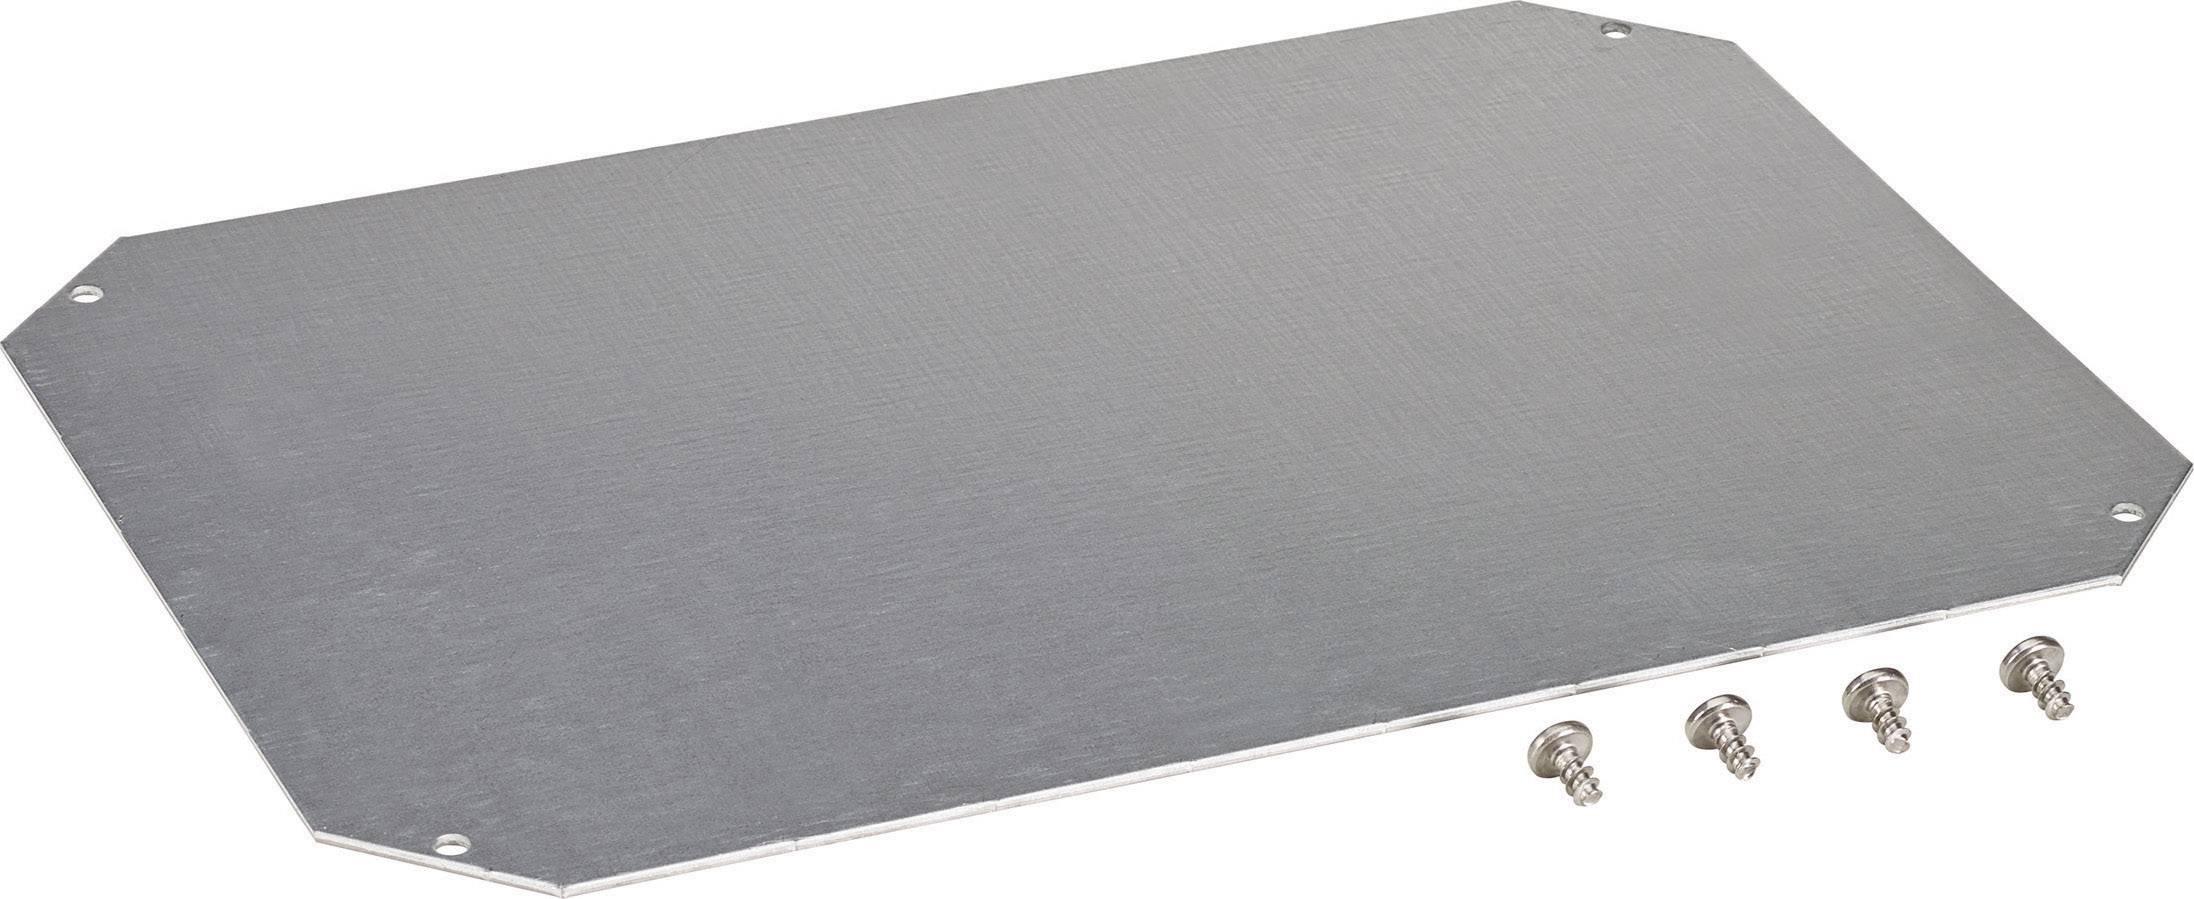 Montážna doska oceľový plech Fibox ARCA 8120733, (d x š) 400 mm x 300 mm